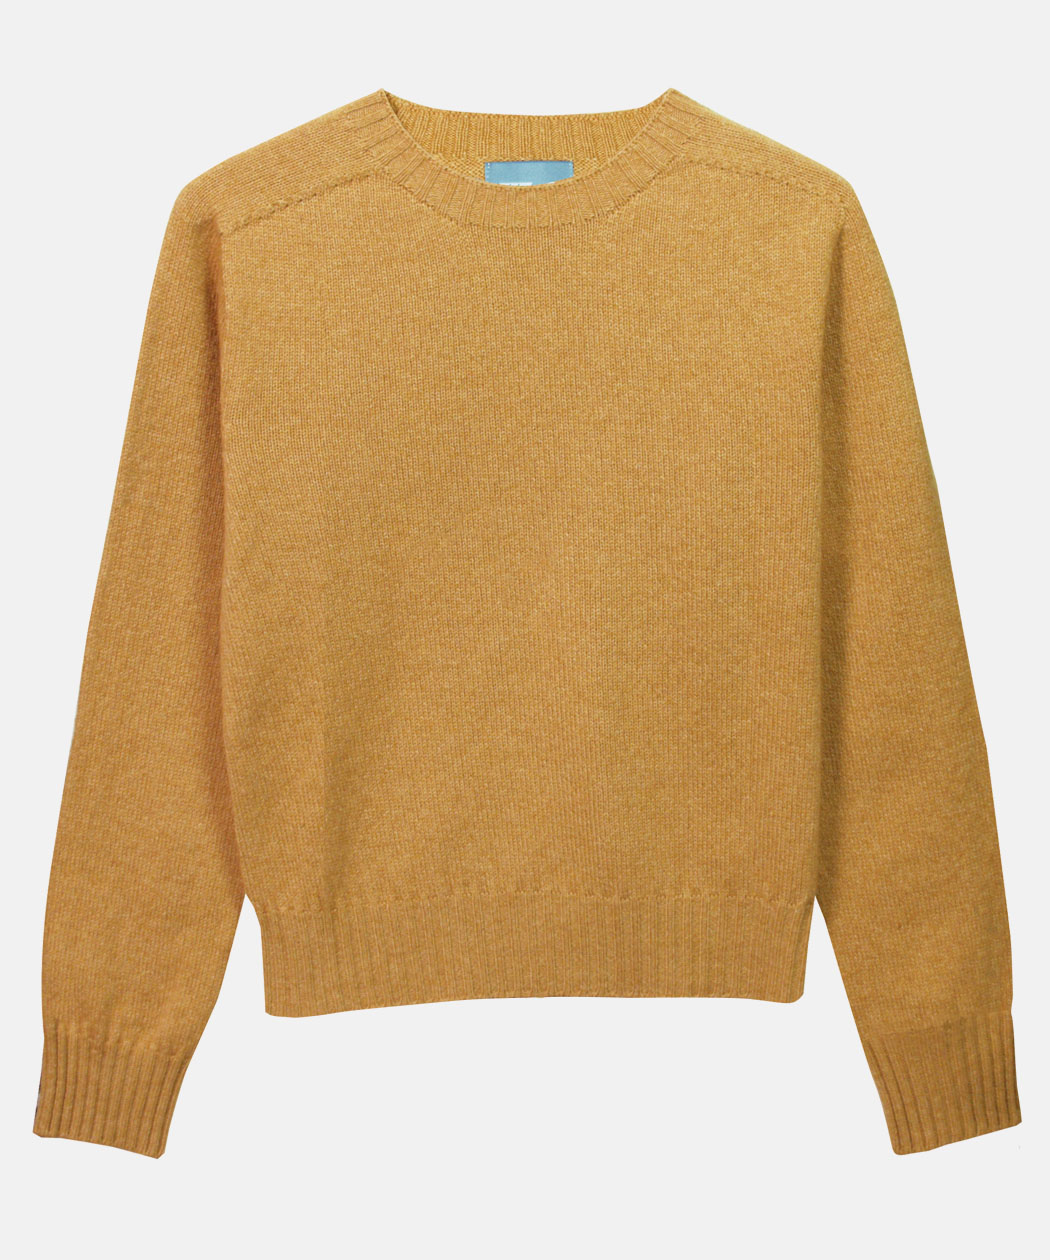 T-lab bruce spring knitwear